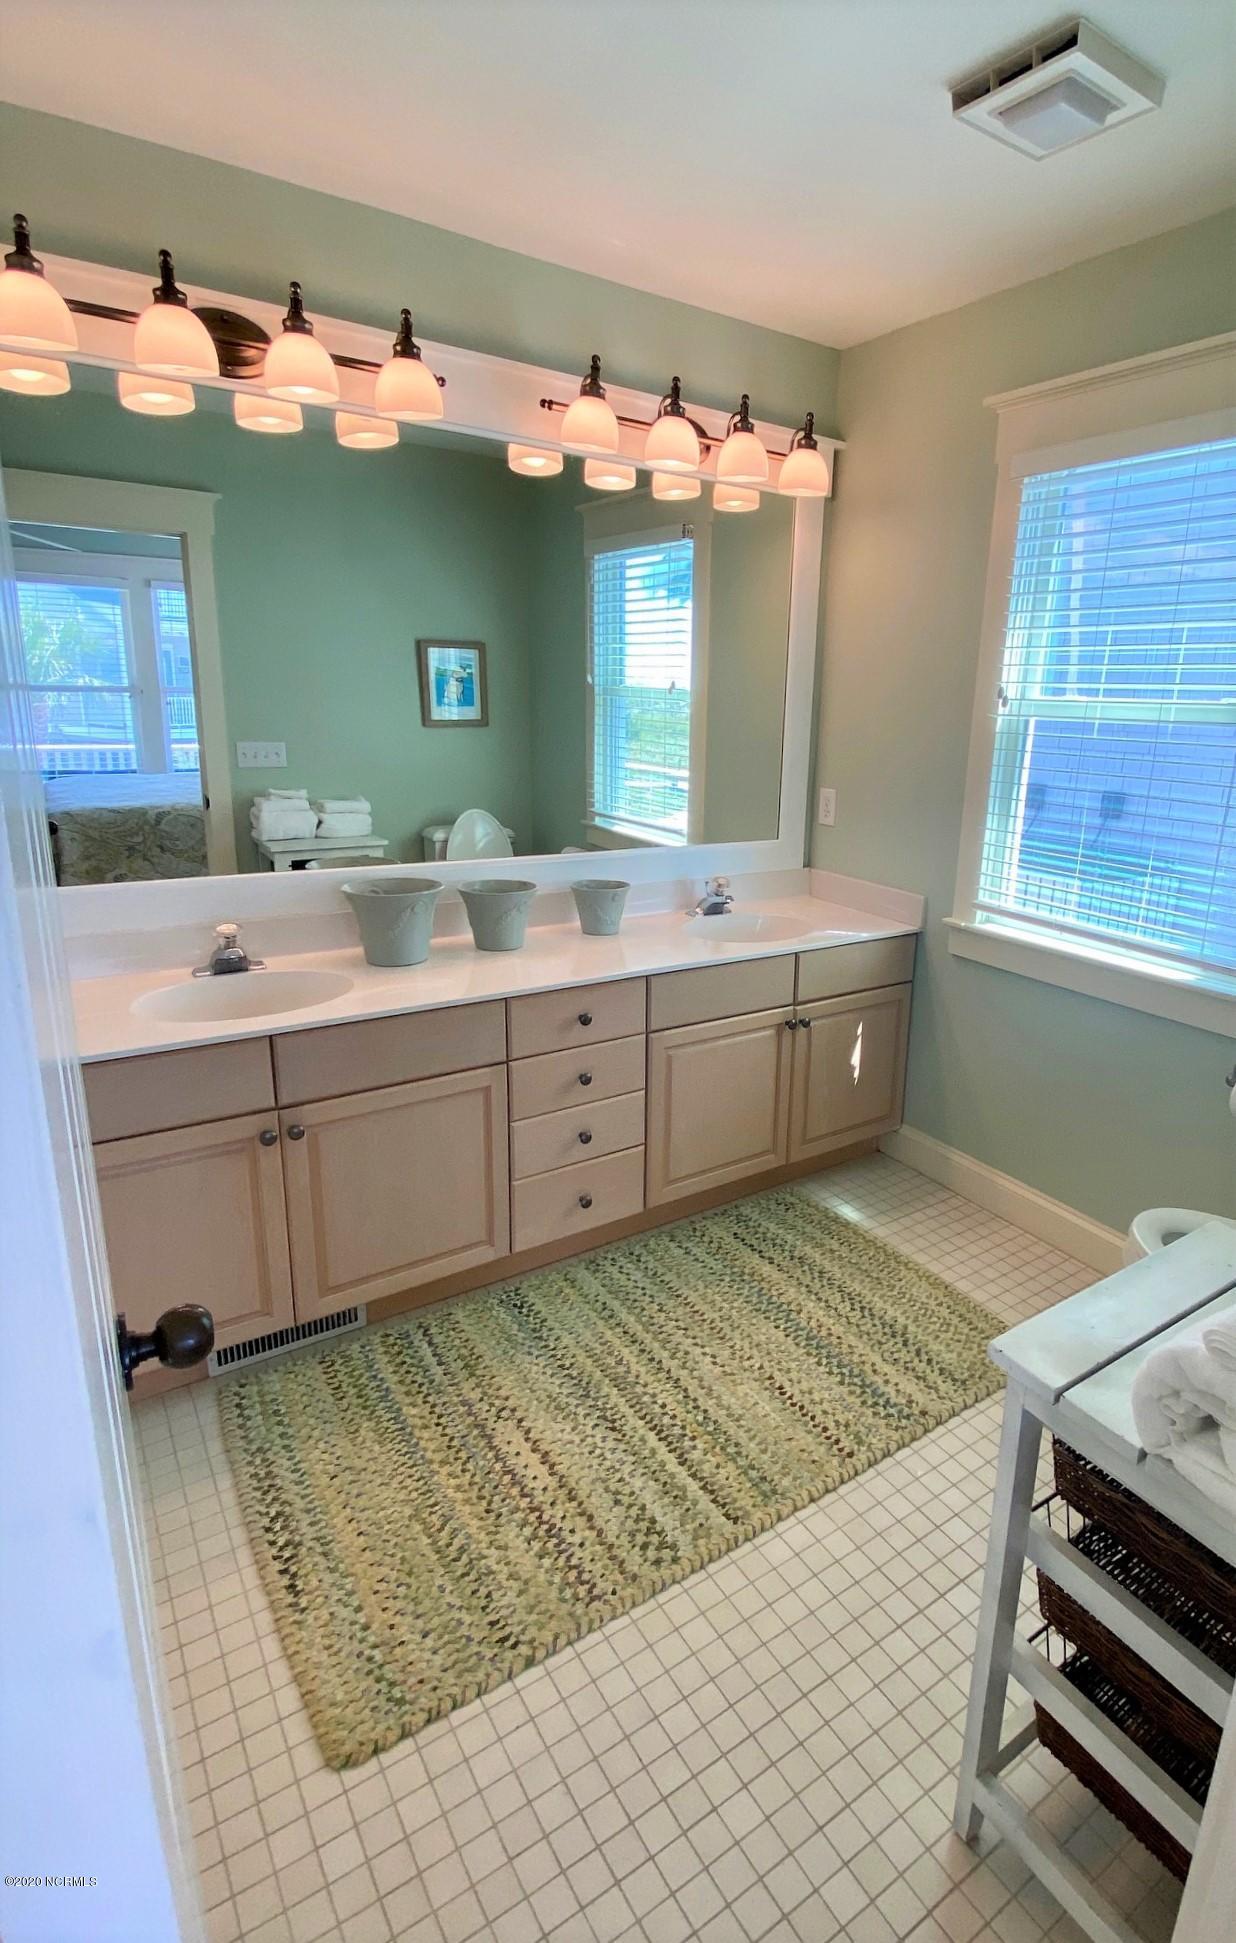 825 Bald Head Wynd, Bald Head Island, North Carolina 28461, 3 Bedrooms Bedrooms, 6 Rooms Rooms,3 BathroomsBathrooms,Single family residence,For sale,Bald Head Wynd,100231112